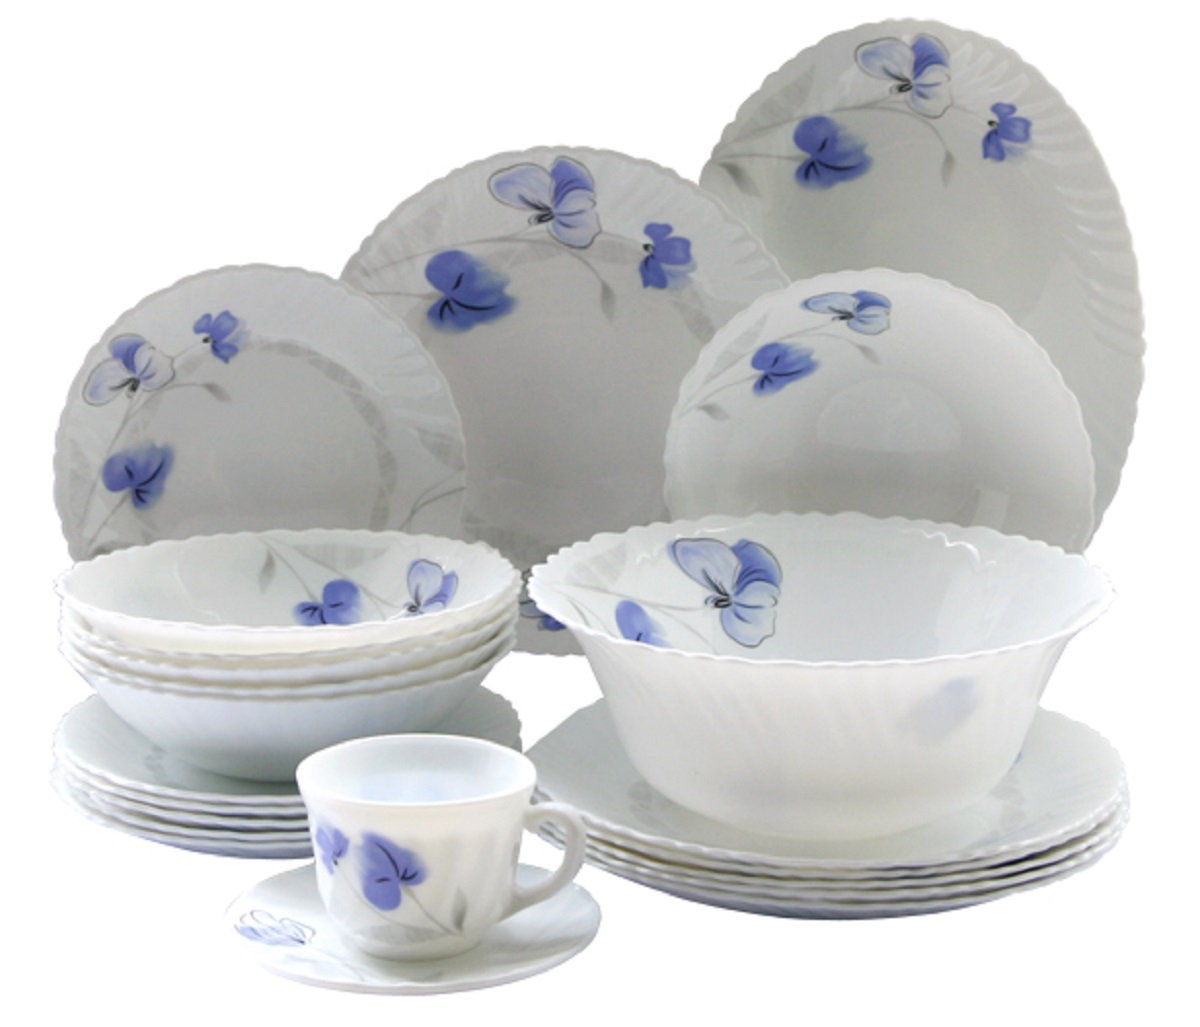 Сервиз столовый Chinbull Нанси, цвет: белый, синий, 32 предмета тарелка обеденная chinbull лоран диаметр 23 см